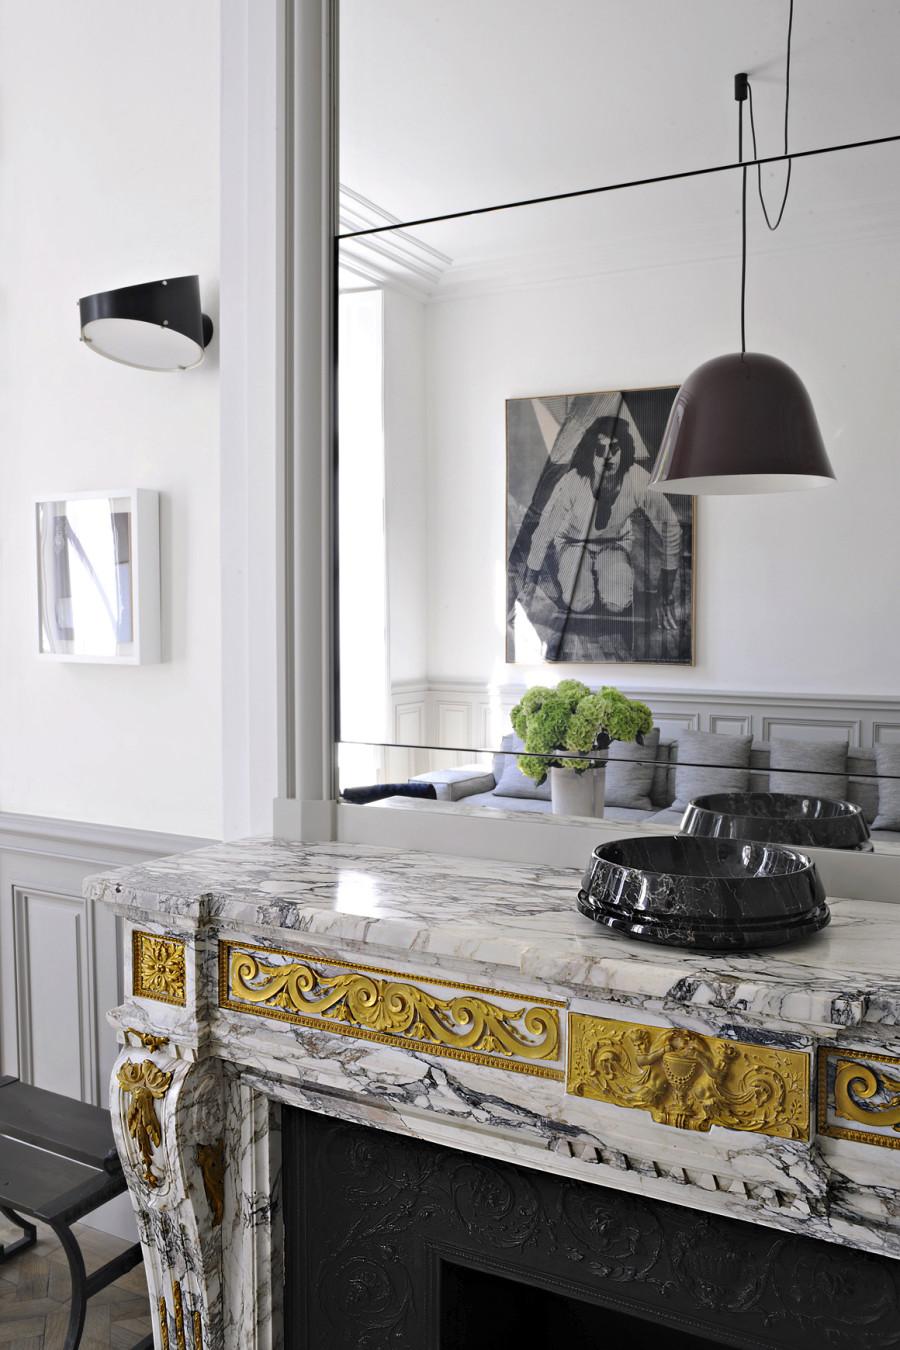 Paris-apartment-by-joseph-dirand-3